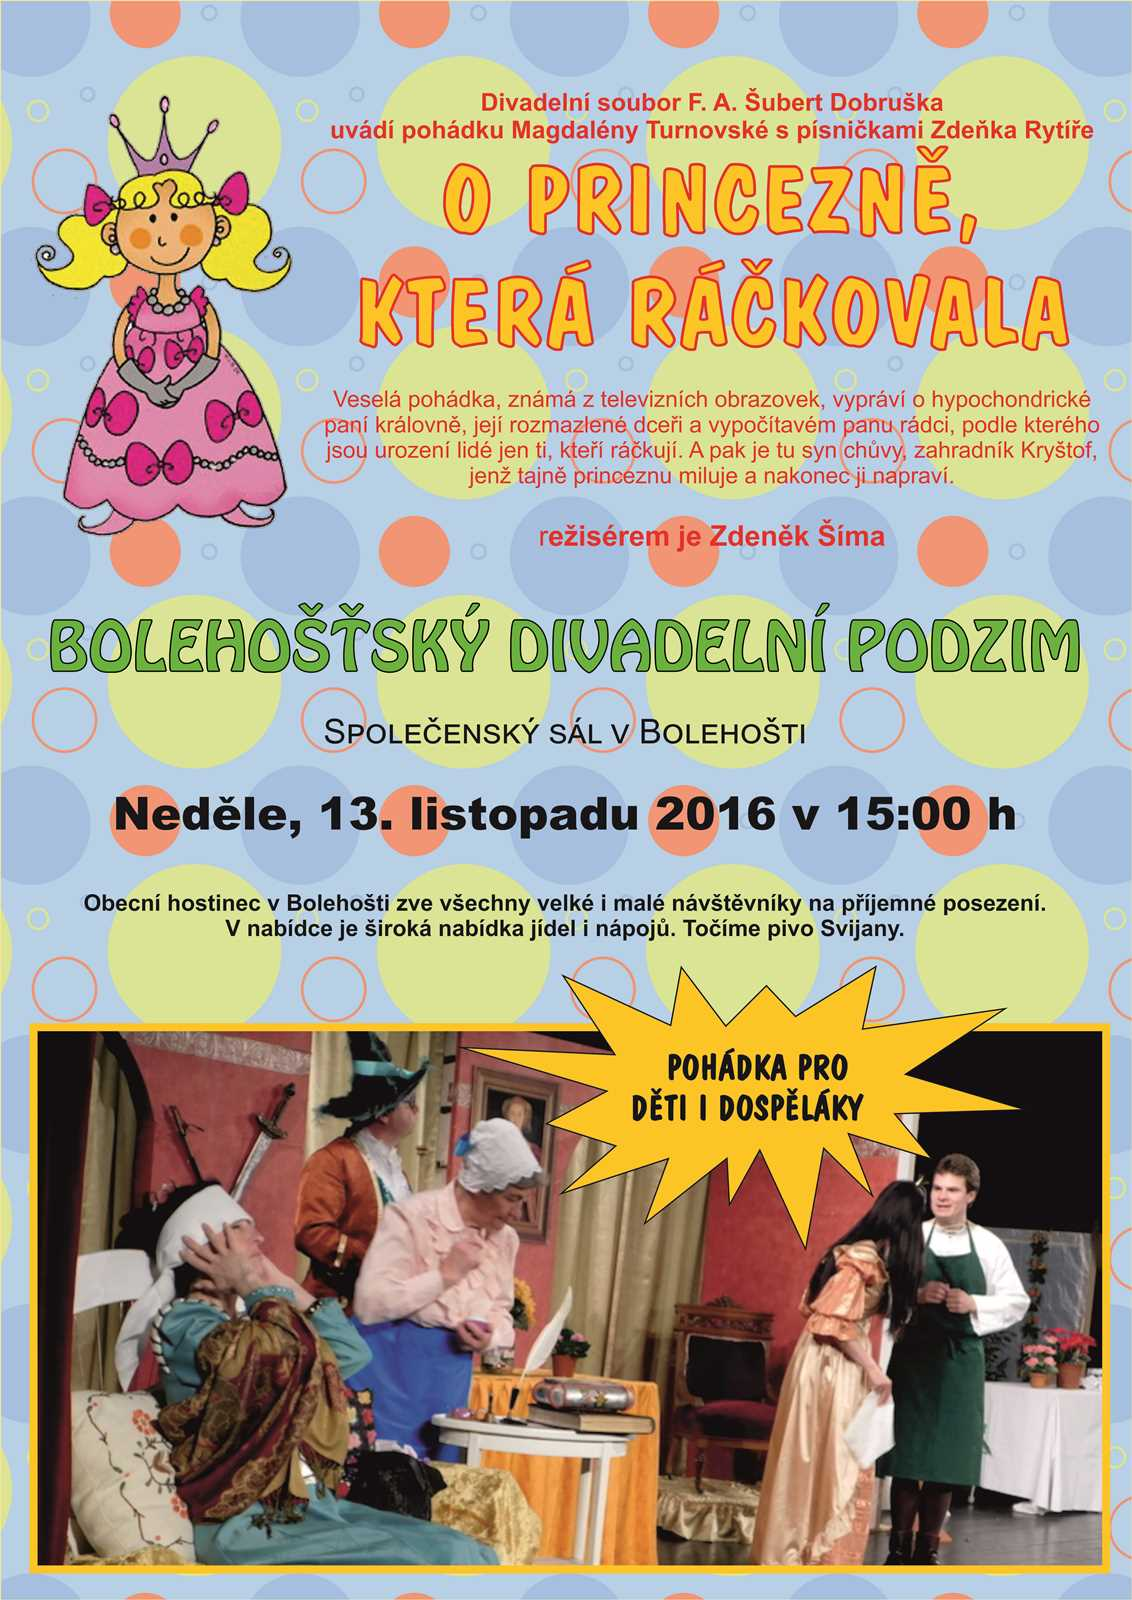 divadelni-podzim-2016-pohadka_str2_maly